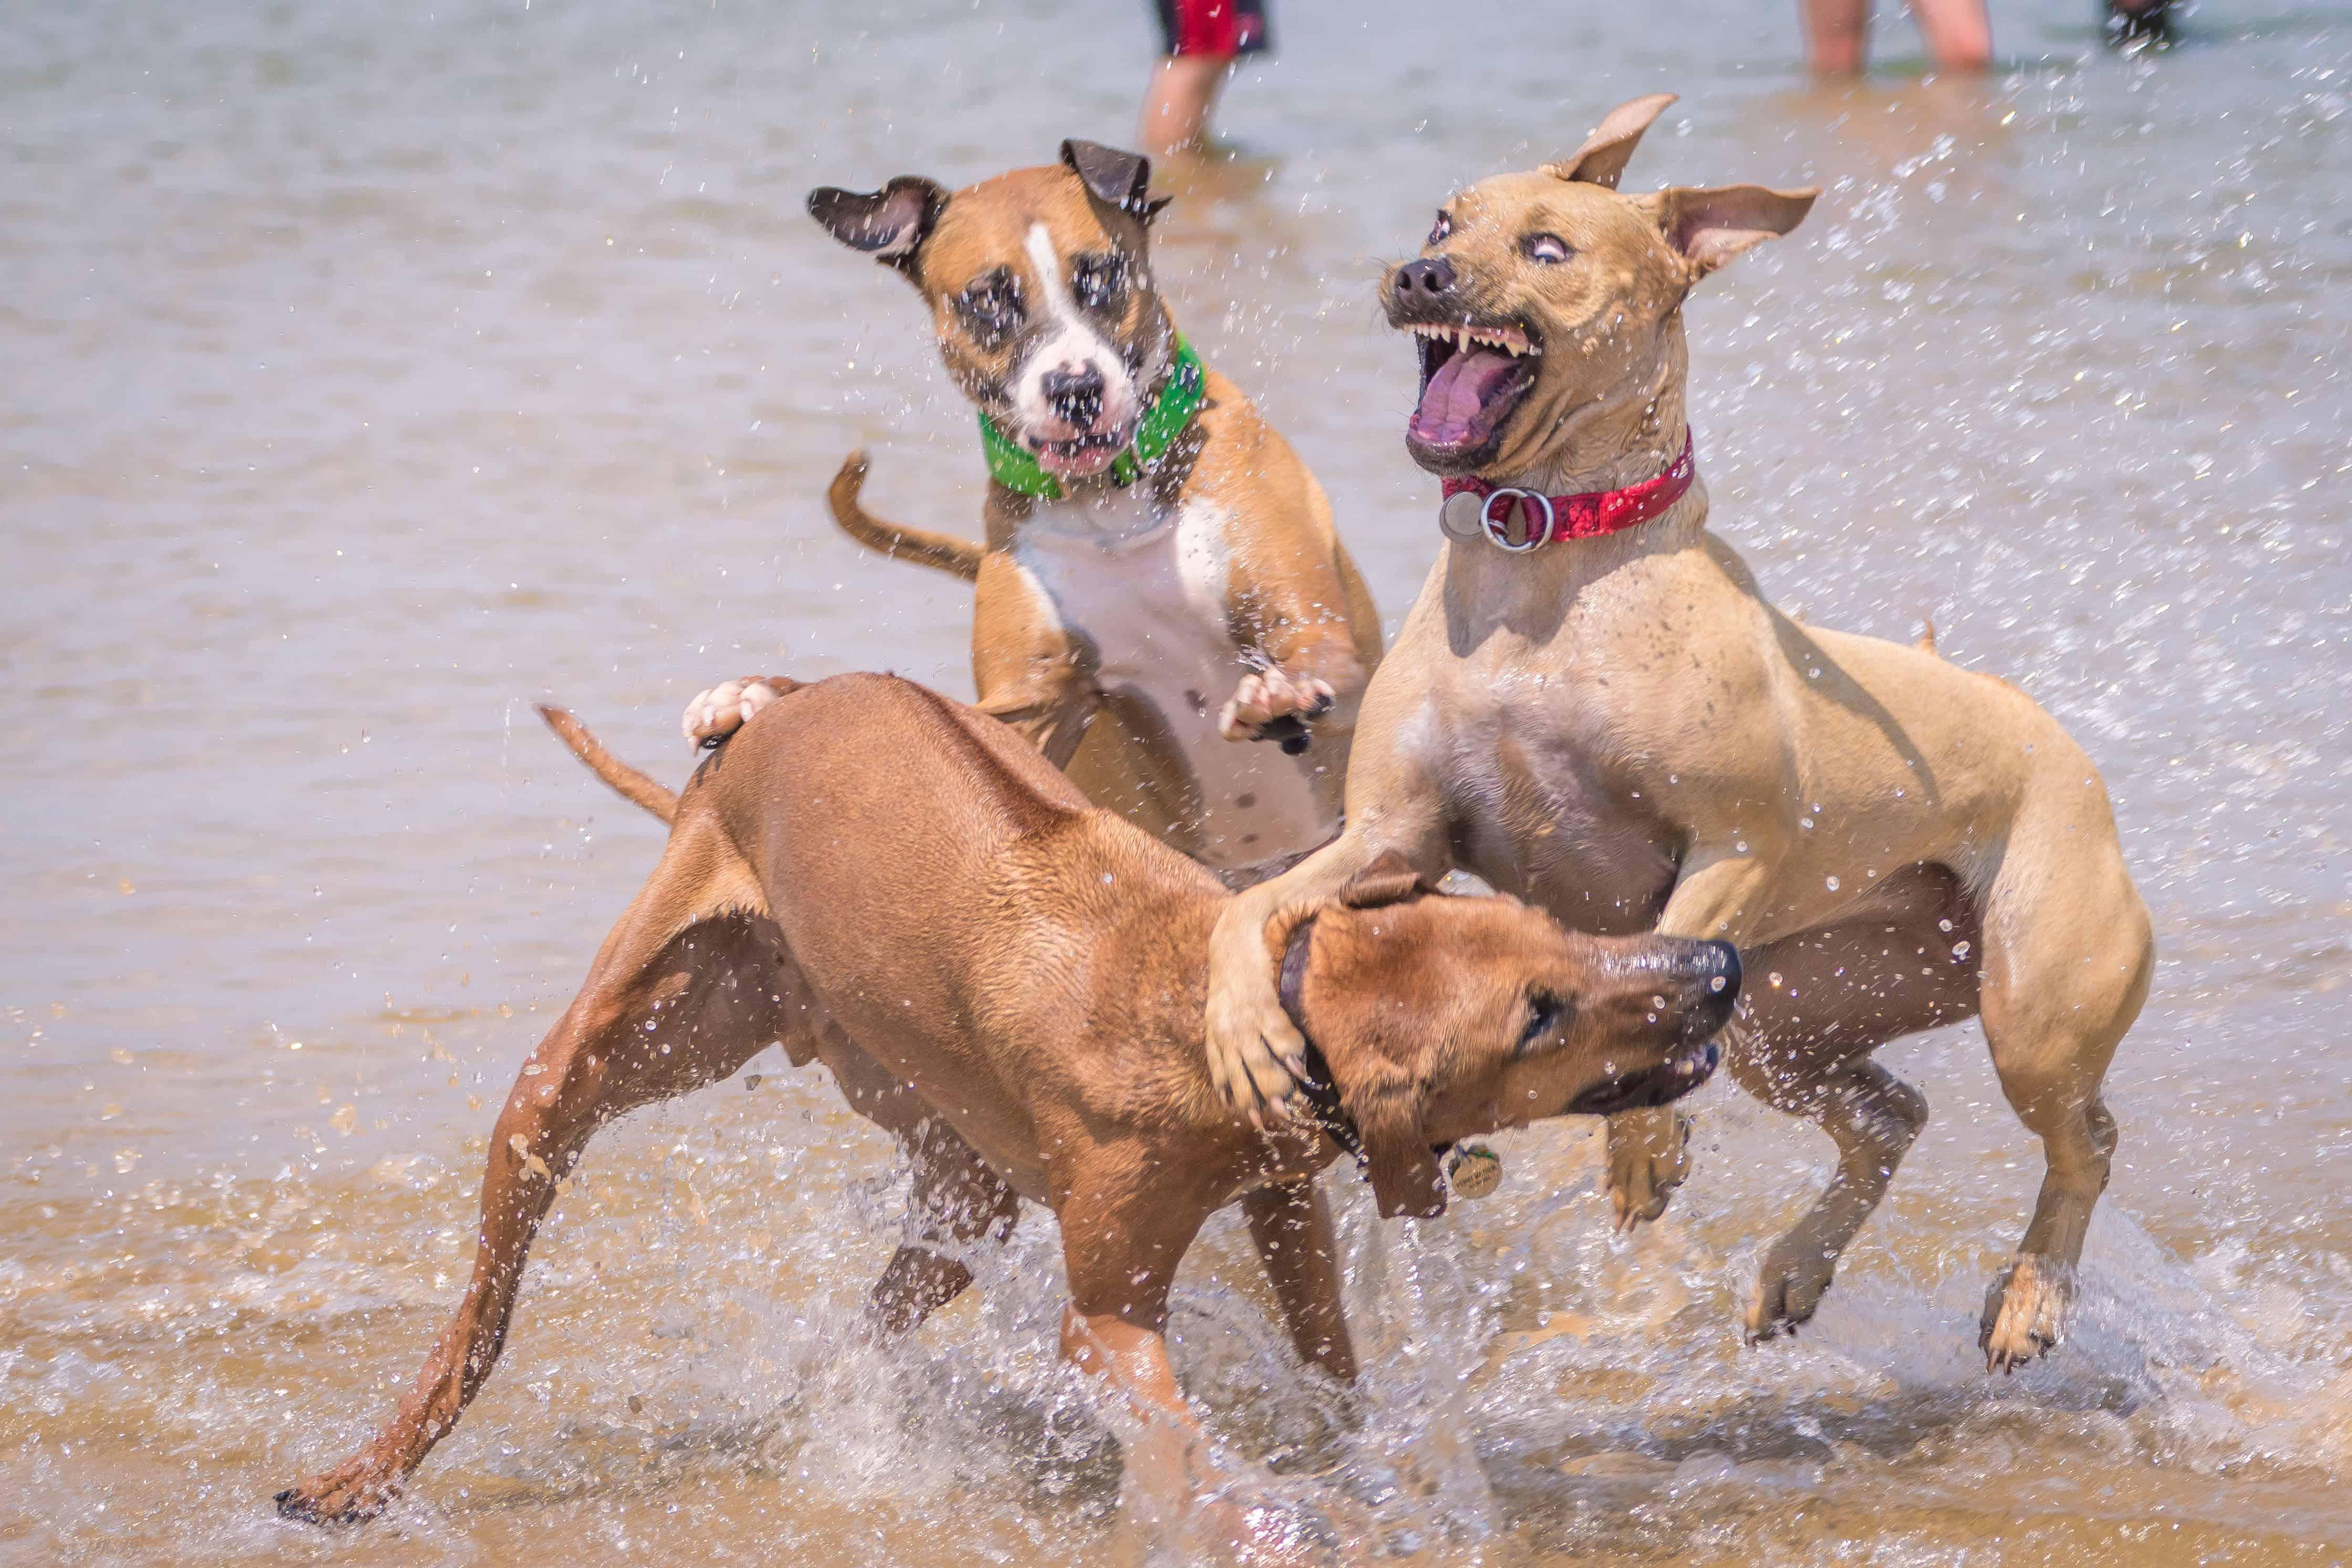 Rhodesian Ridgeback, puppy, chicago, cute, montrose dog beach